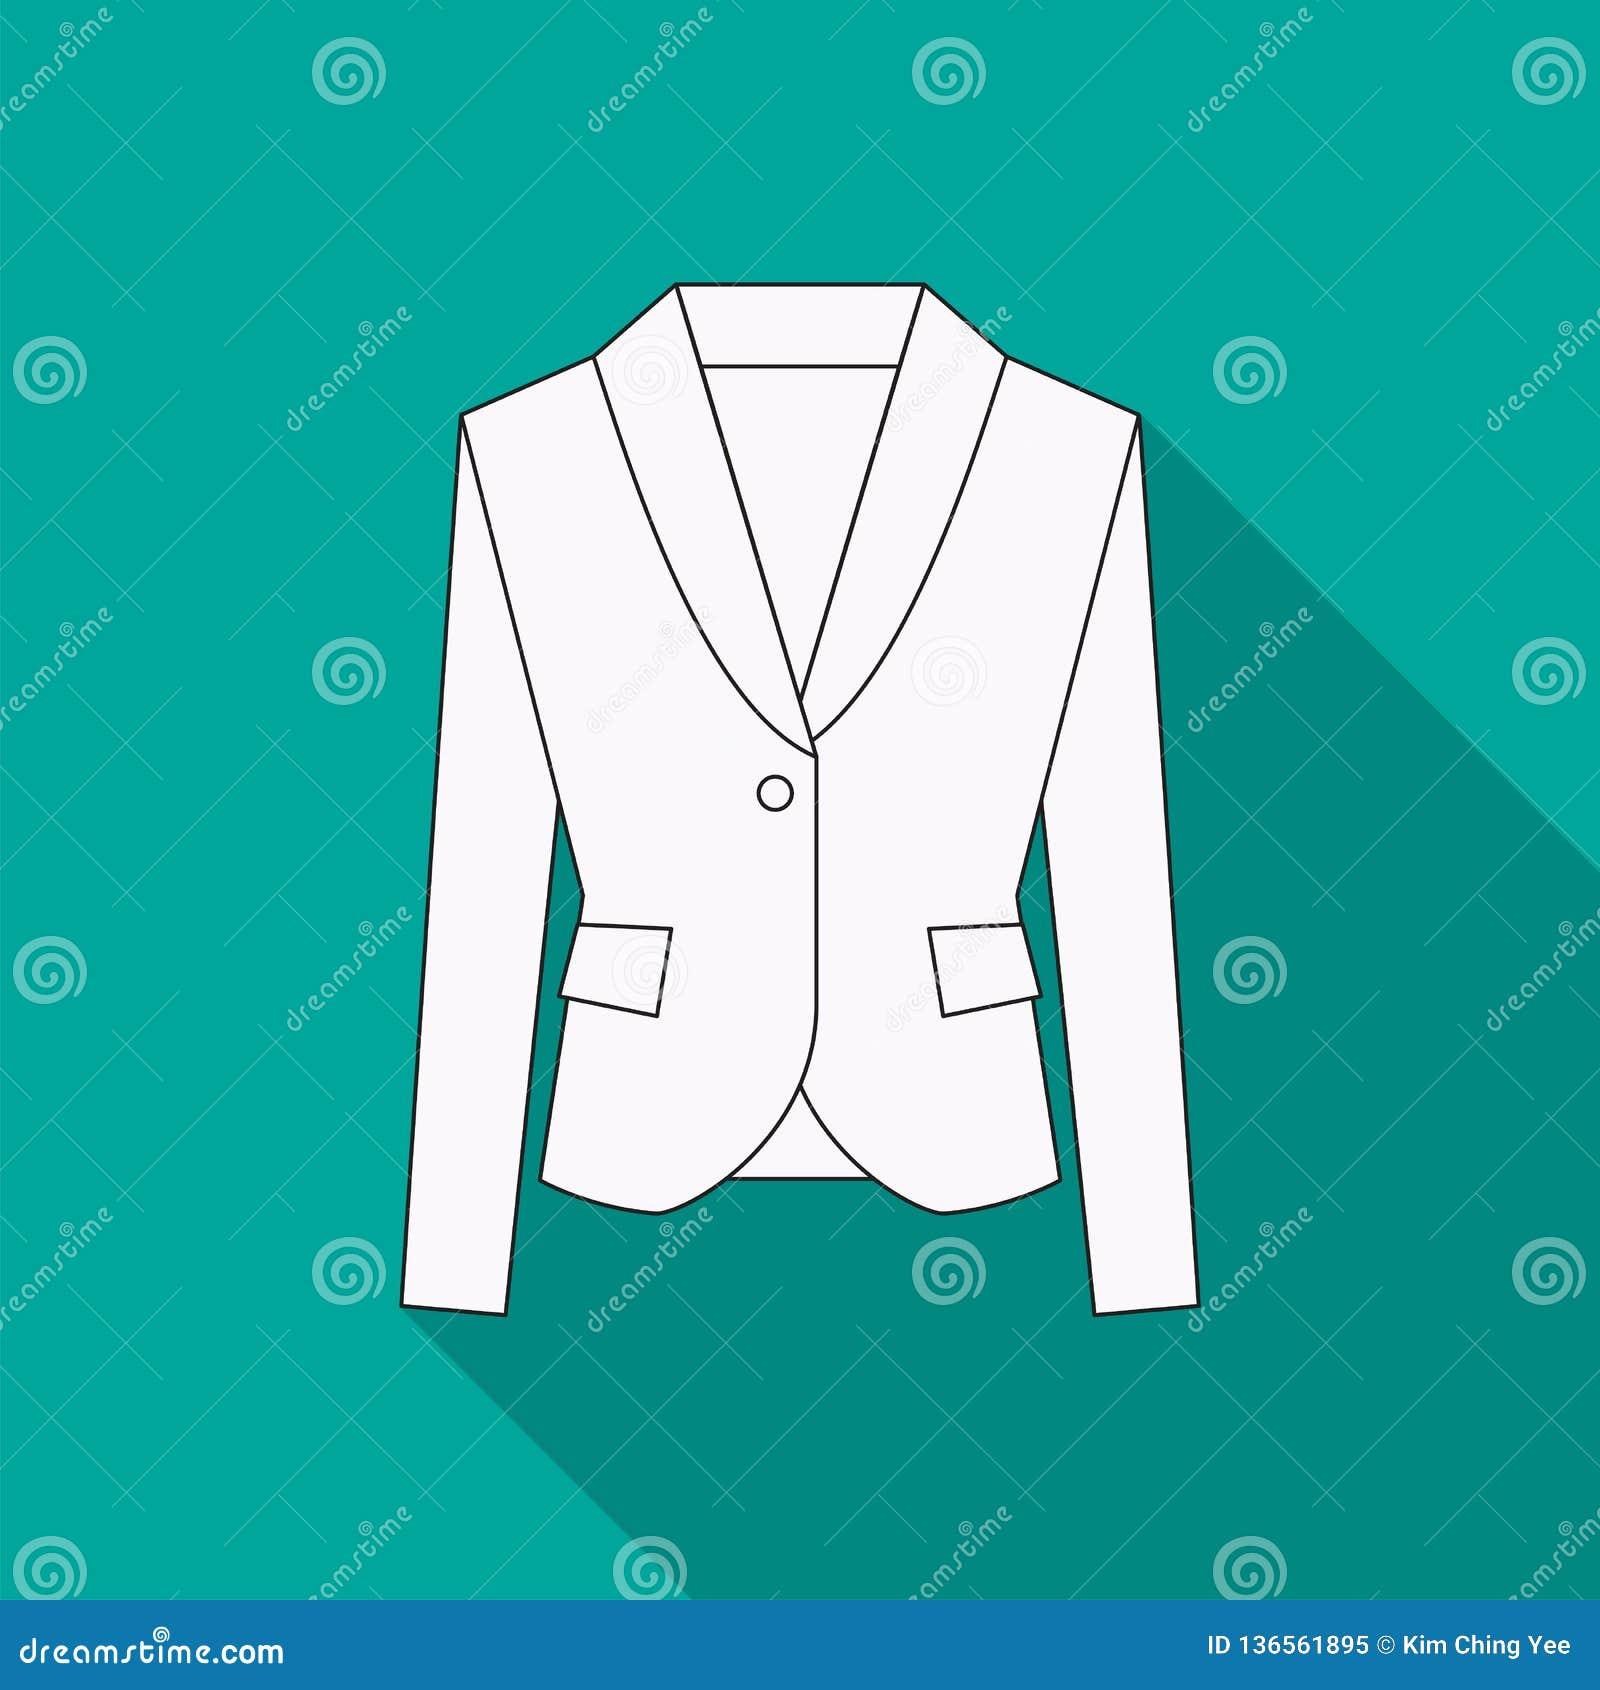 Men blazer or jacket or suit symbol simple flat vector icon in line design